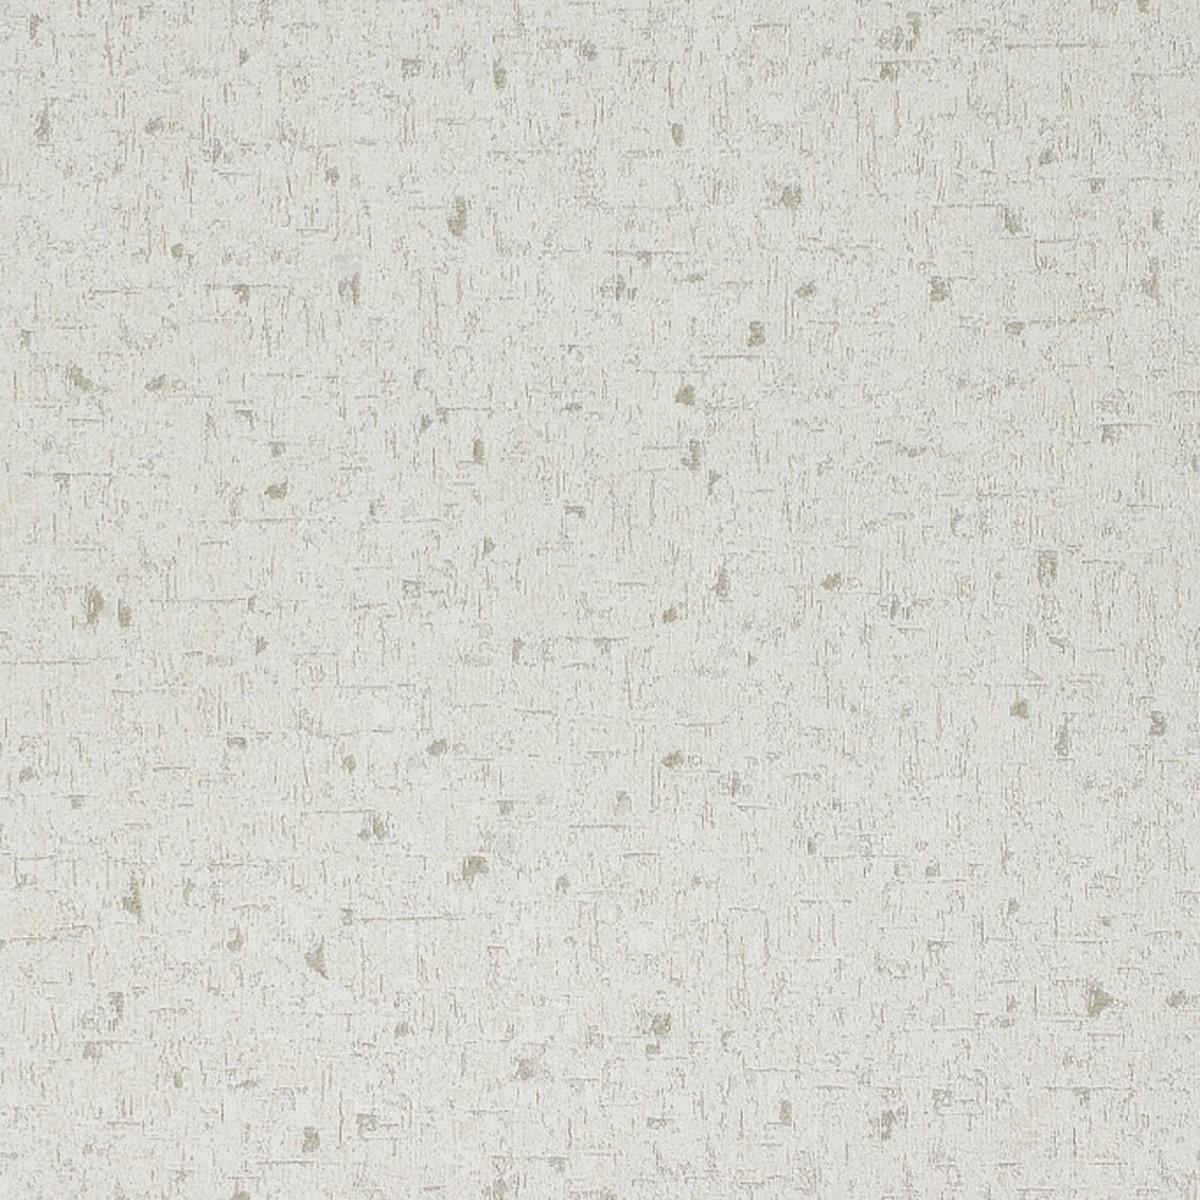 Обои флизелиновые Артекс Freedom бежевые 1.06 м 10169-03